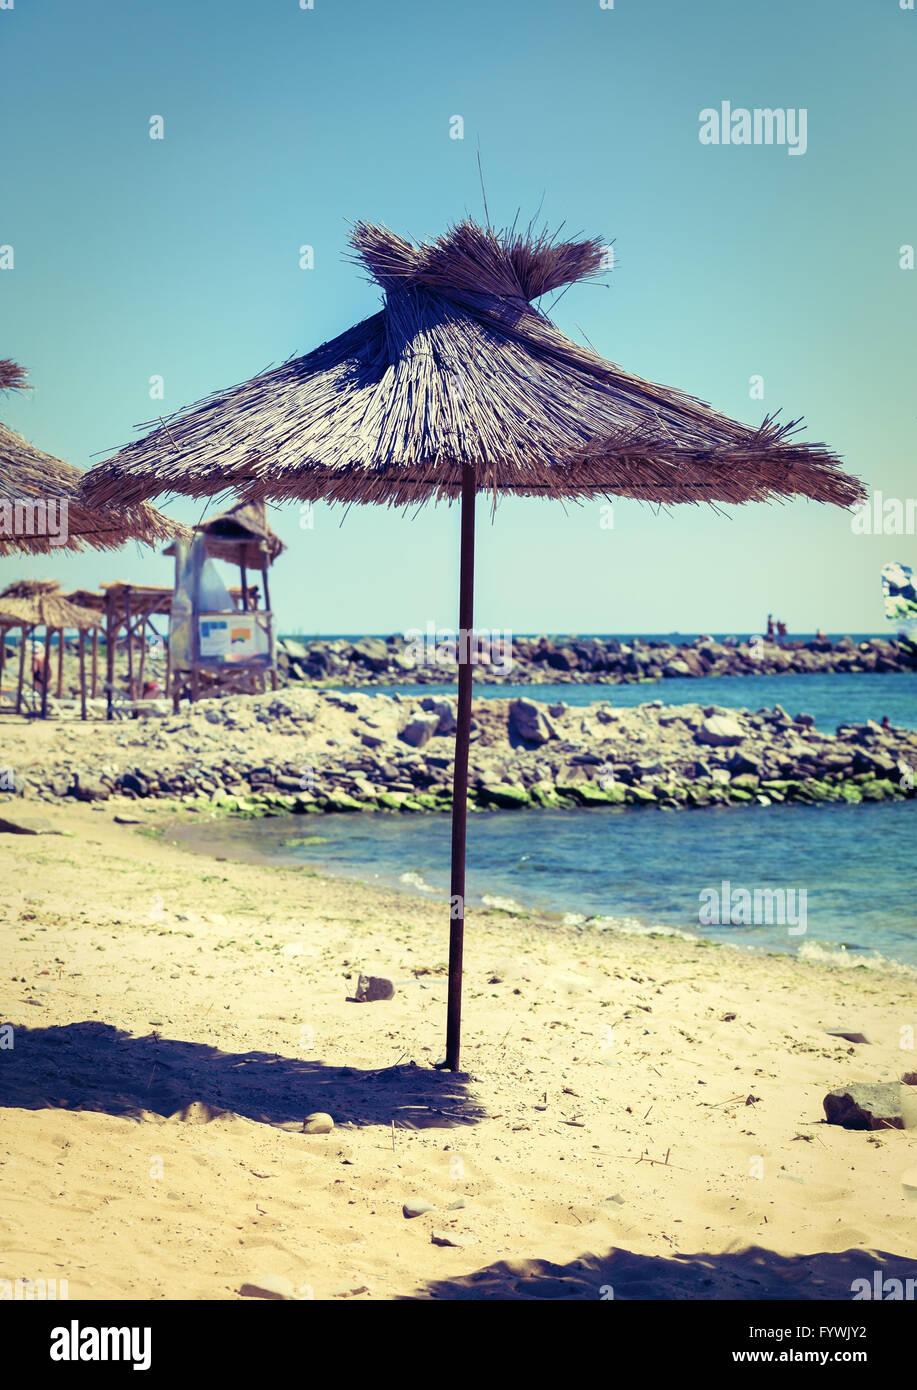 Beach straw umbrella - Stock Image